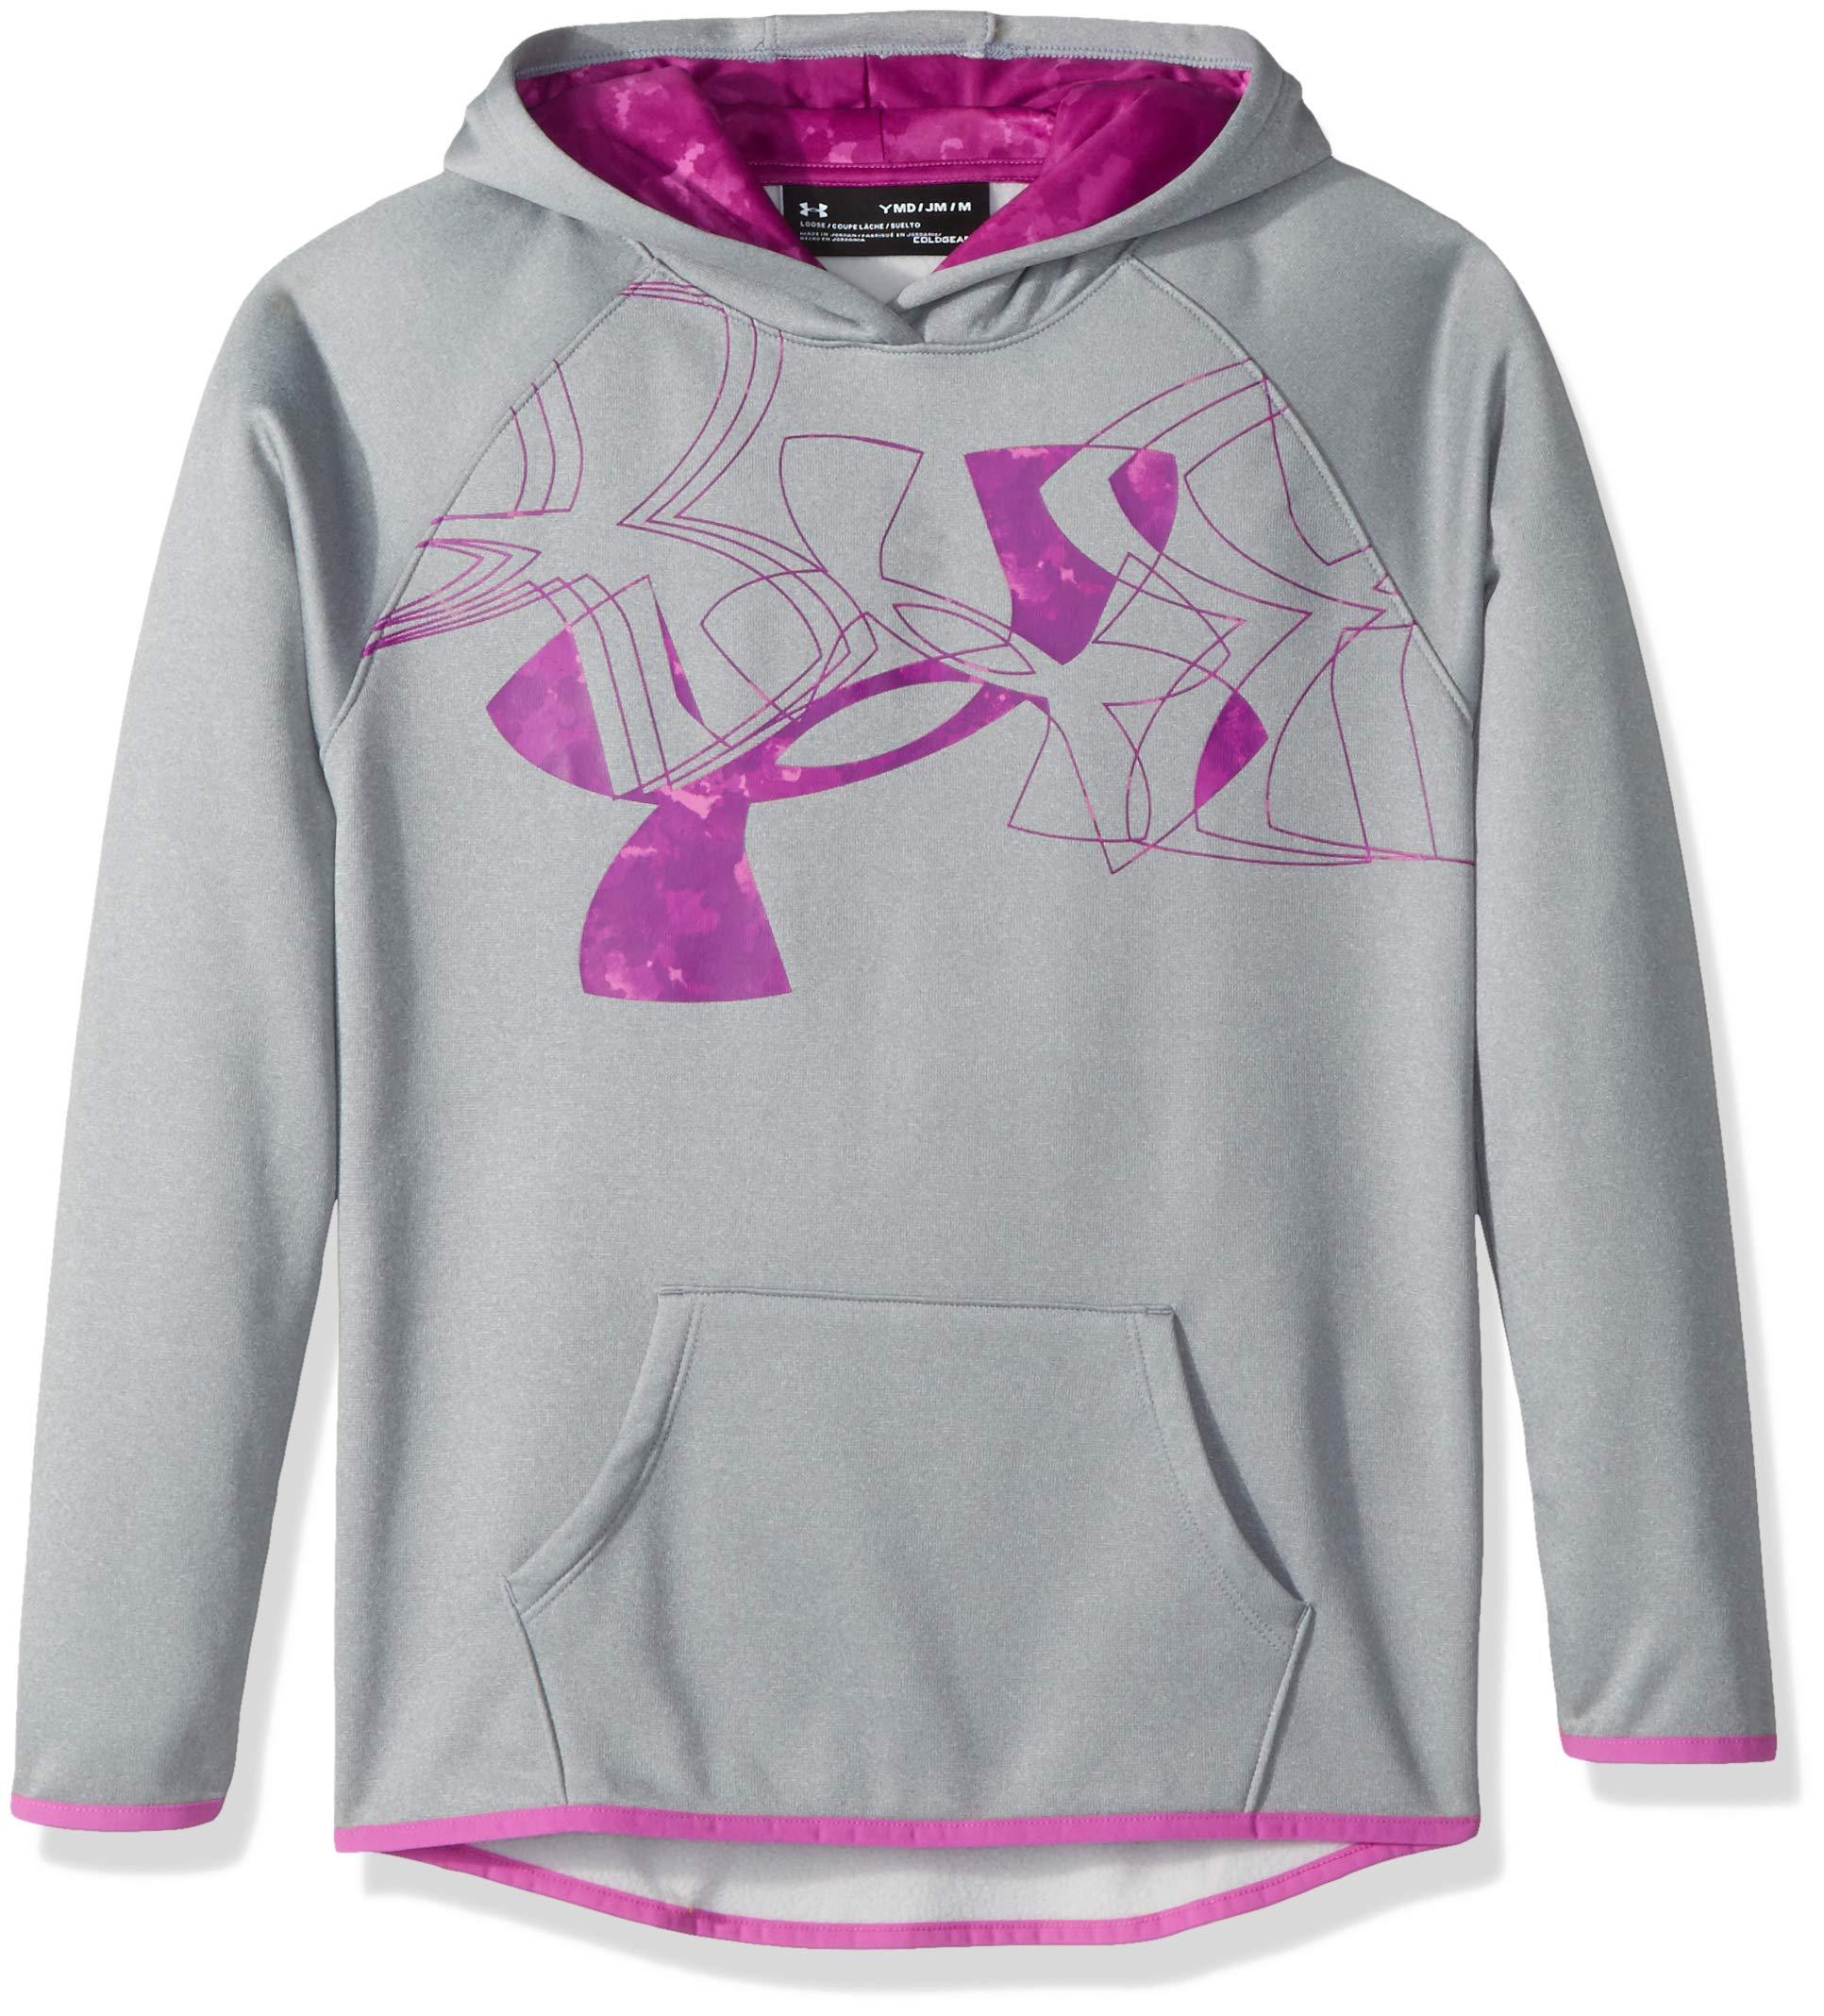 Under Armour Girls Armour Fleece Print Fill Logo Hoodie , Steel Light Heather (037)/Fluo Fuchsia, Youth Medium by Under Armour